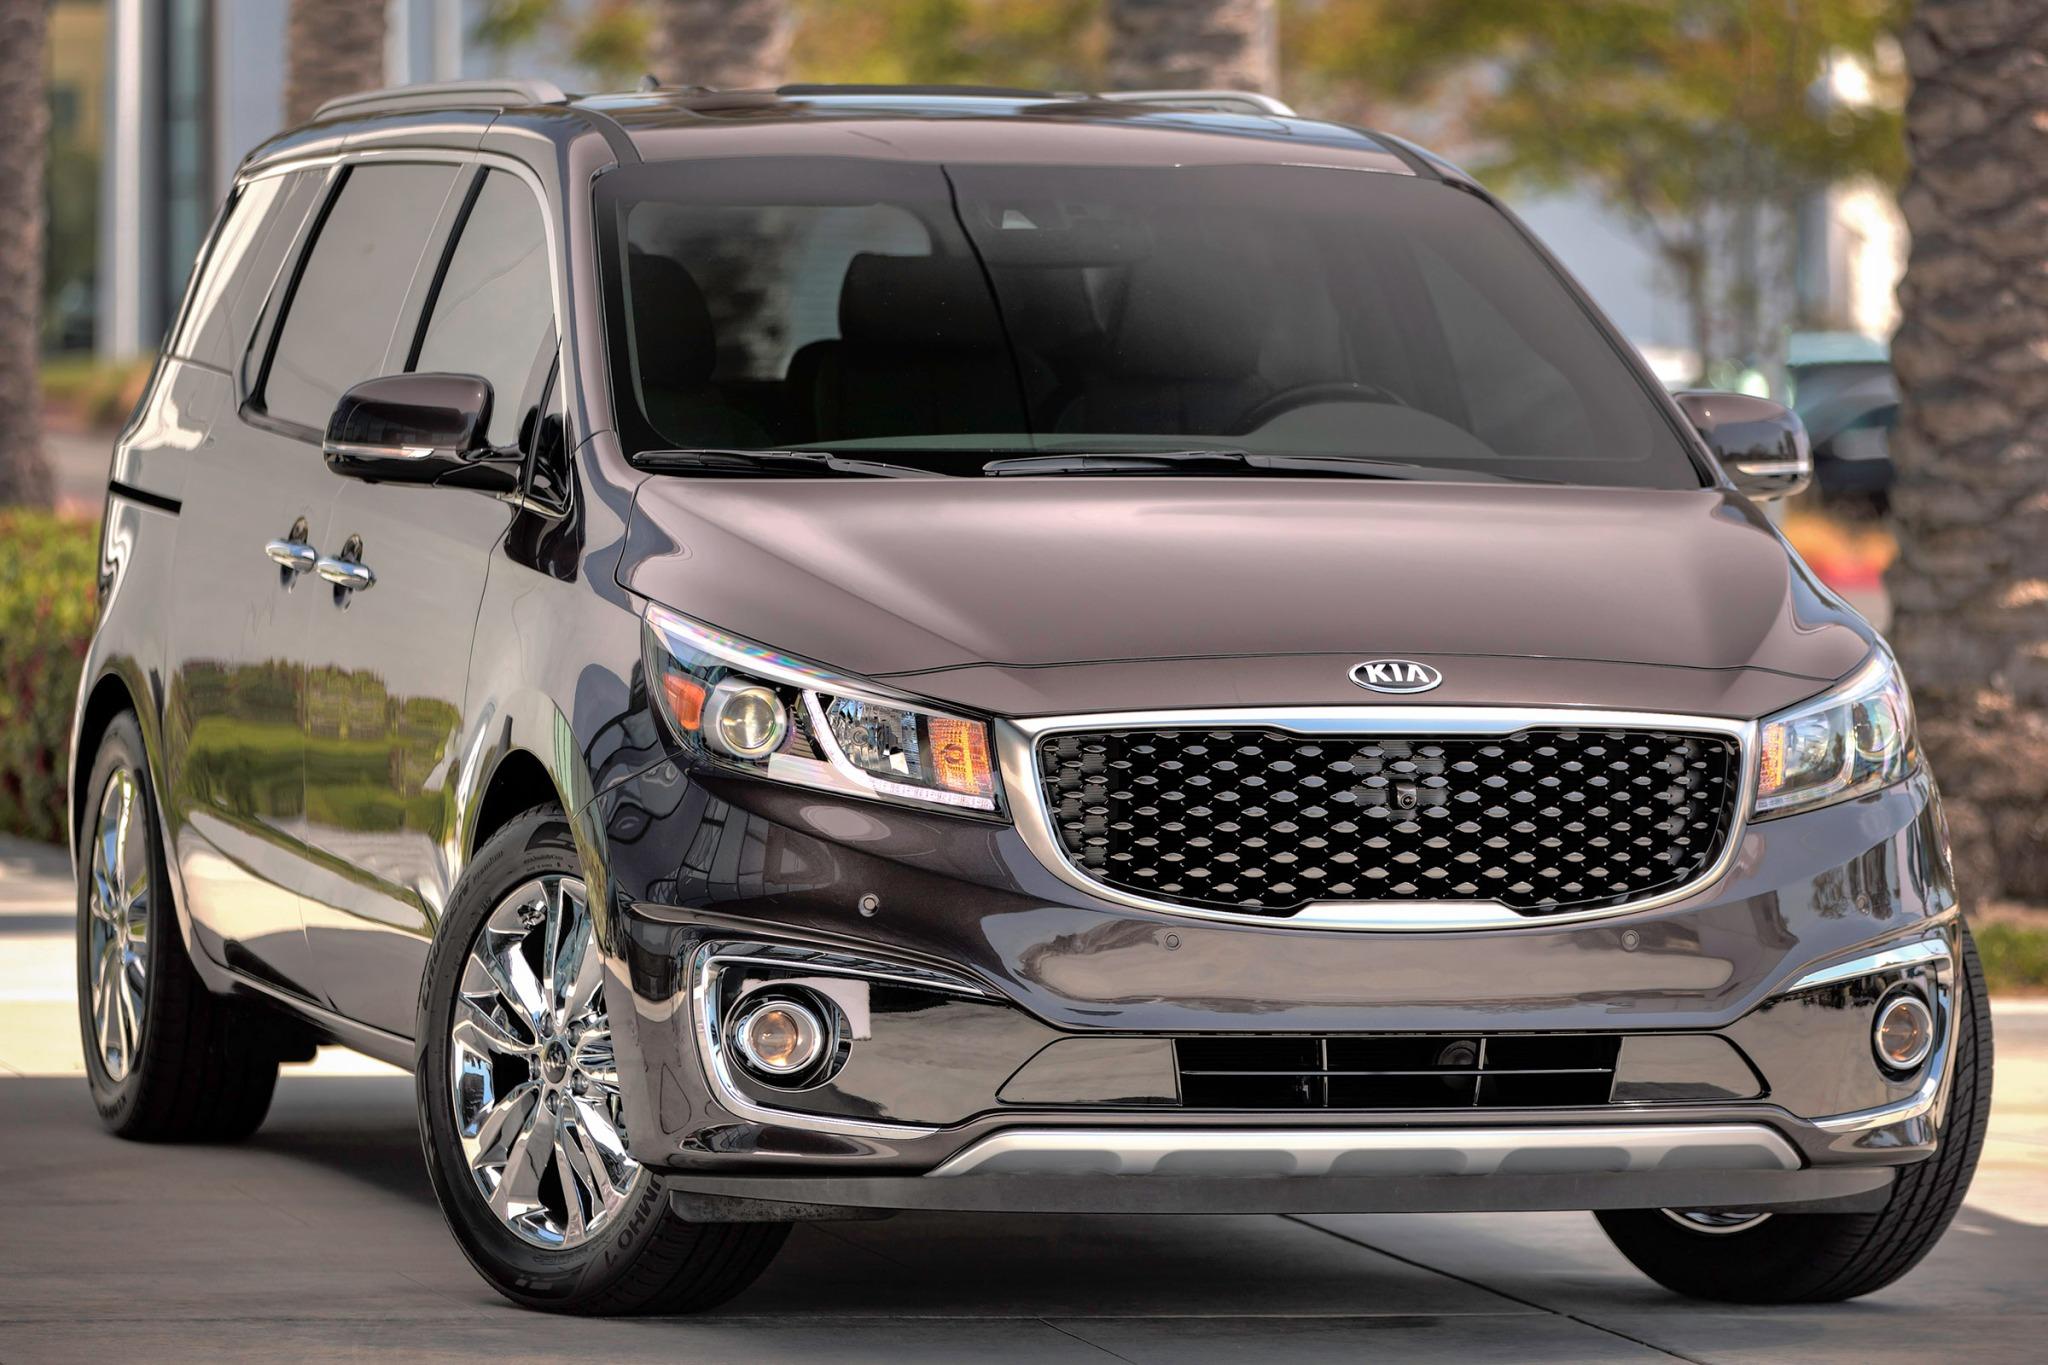 2016 kia sedona passenger minivan sx limited fq oem 1 2048